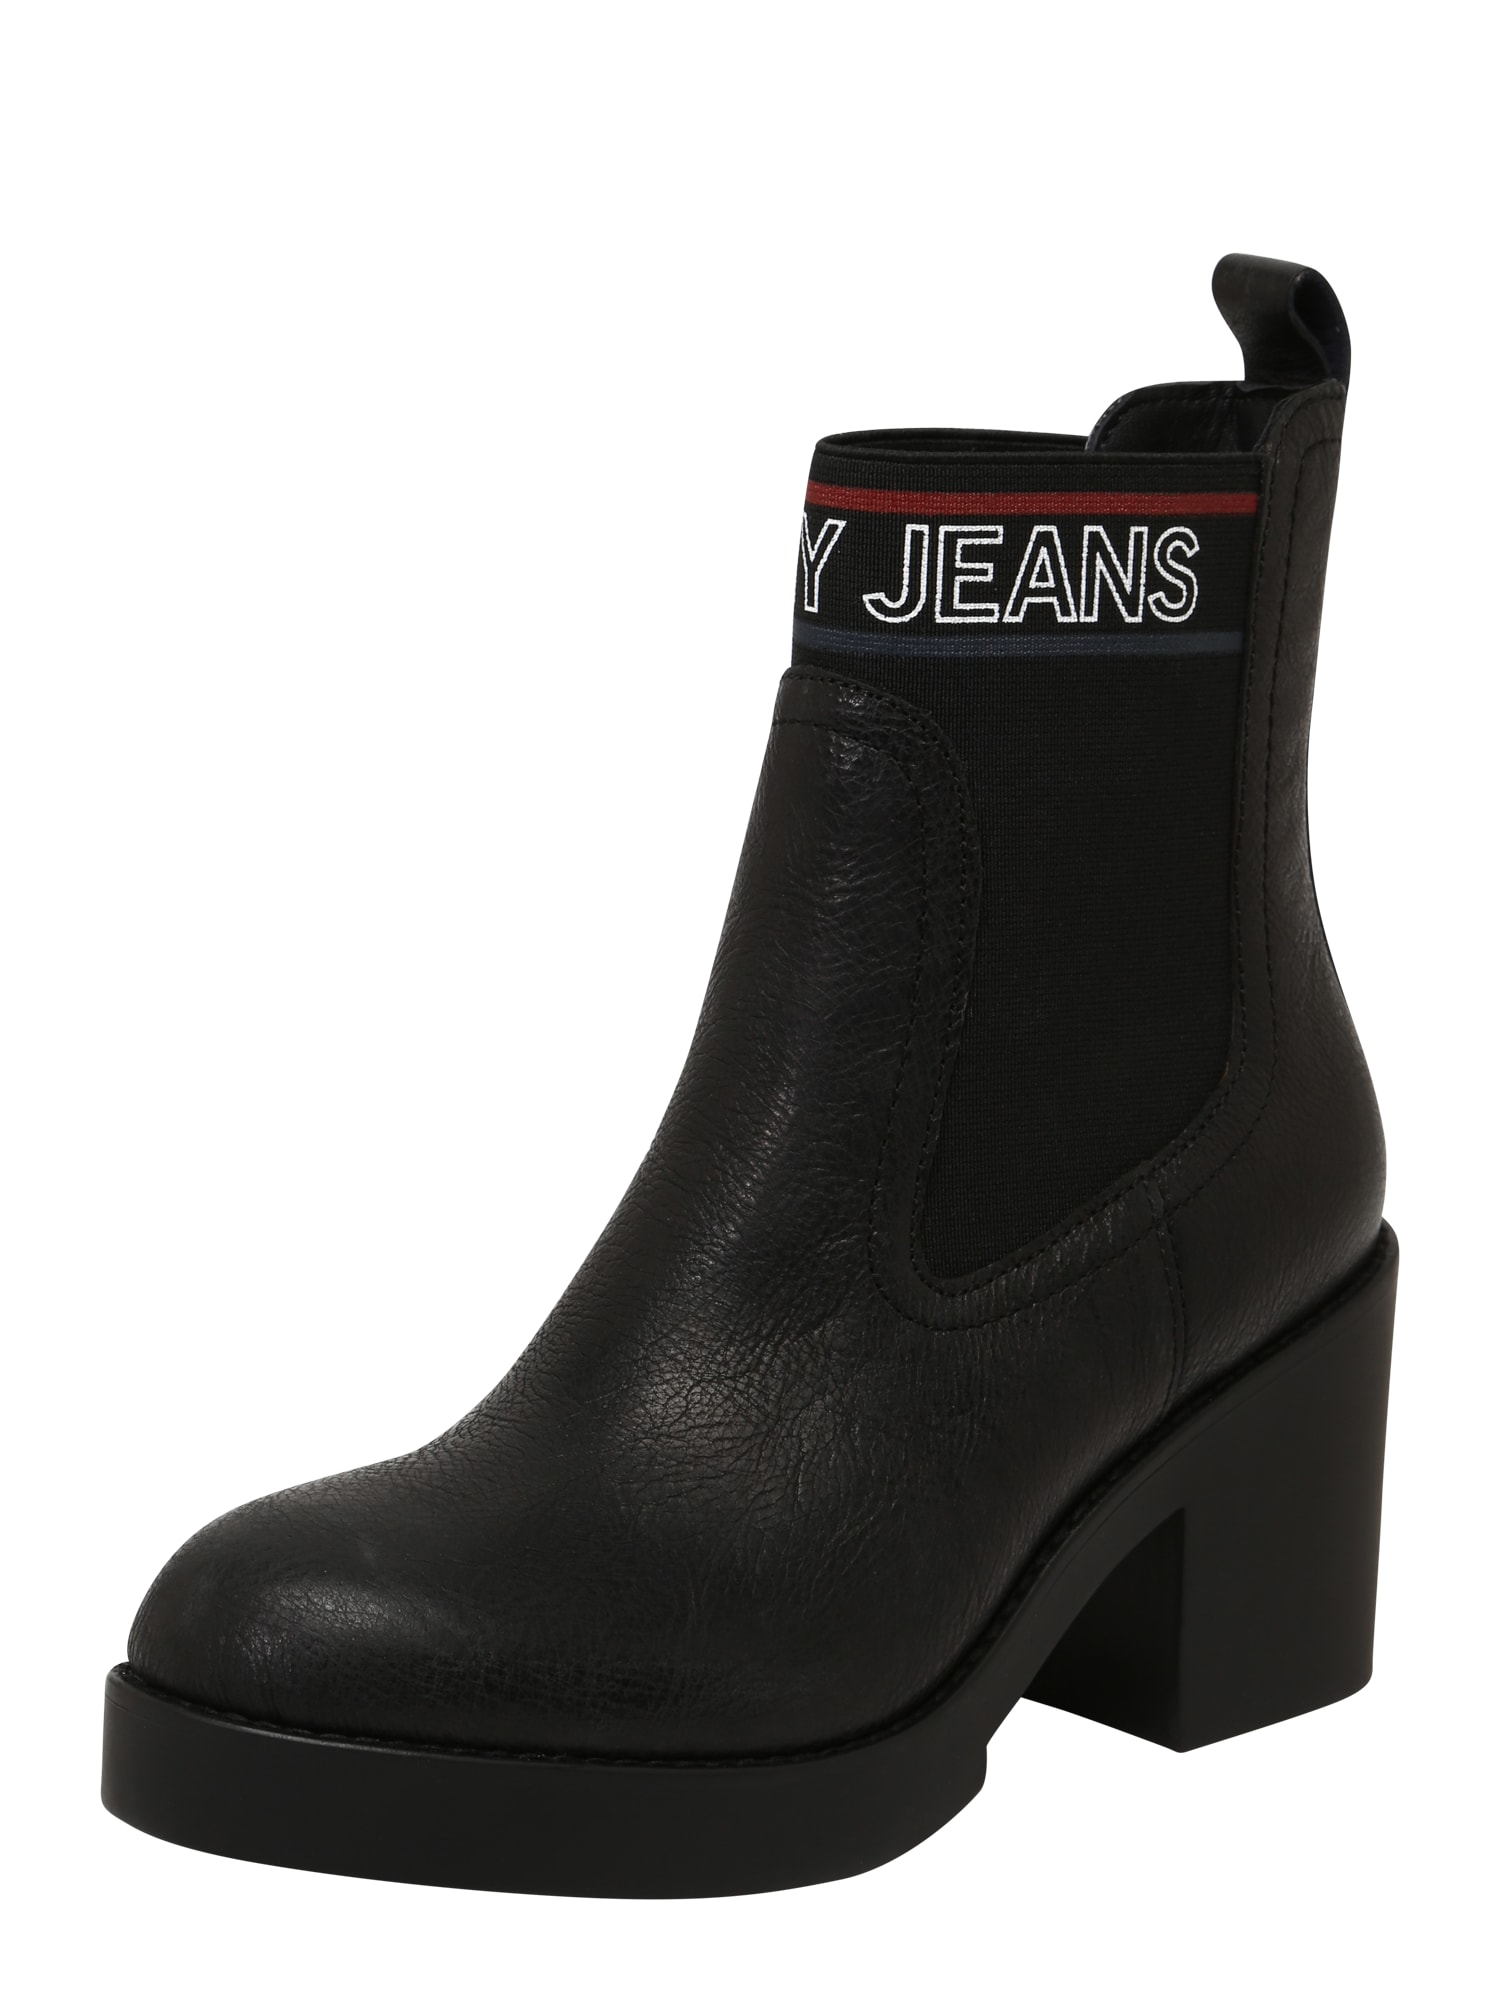 Chelsea boty CORPORATE ELASTIC LEATHER BOOT černá Tommy Jeans